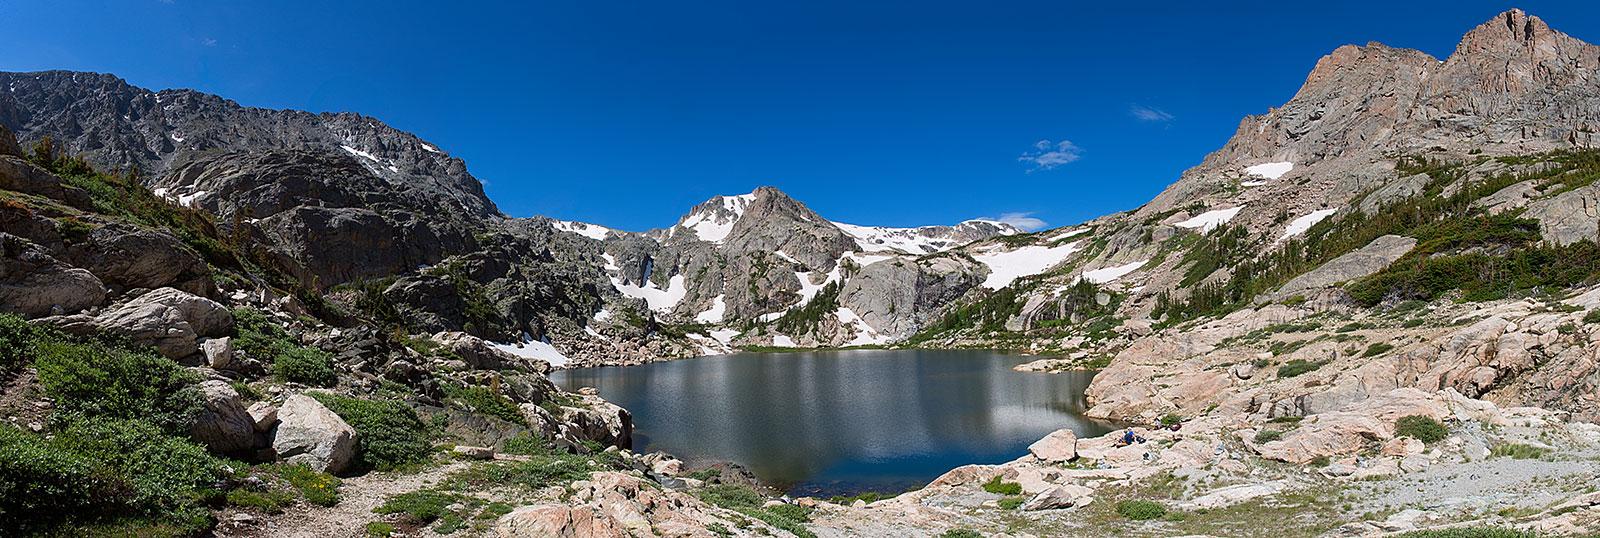 Bluebird Lake, elevation 10,978 ft.